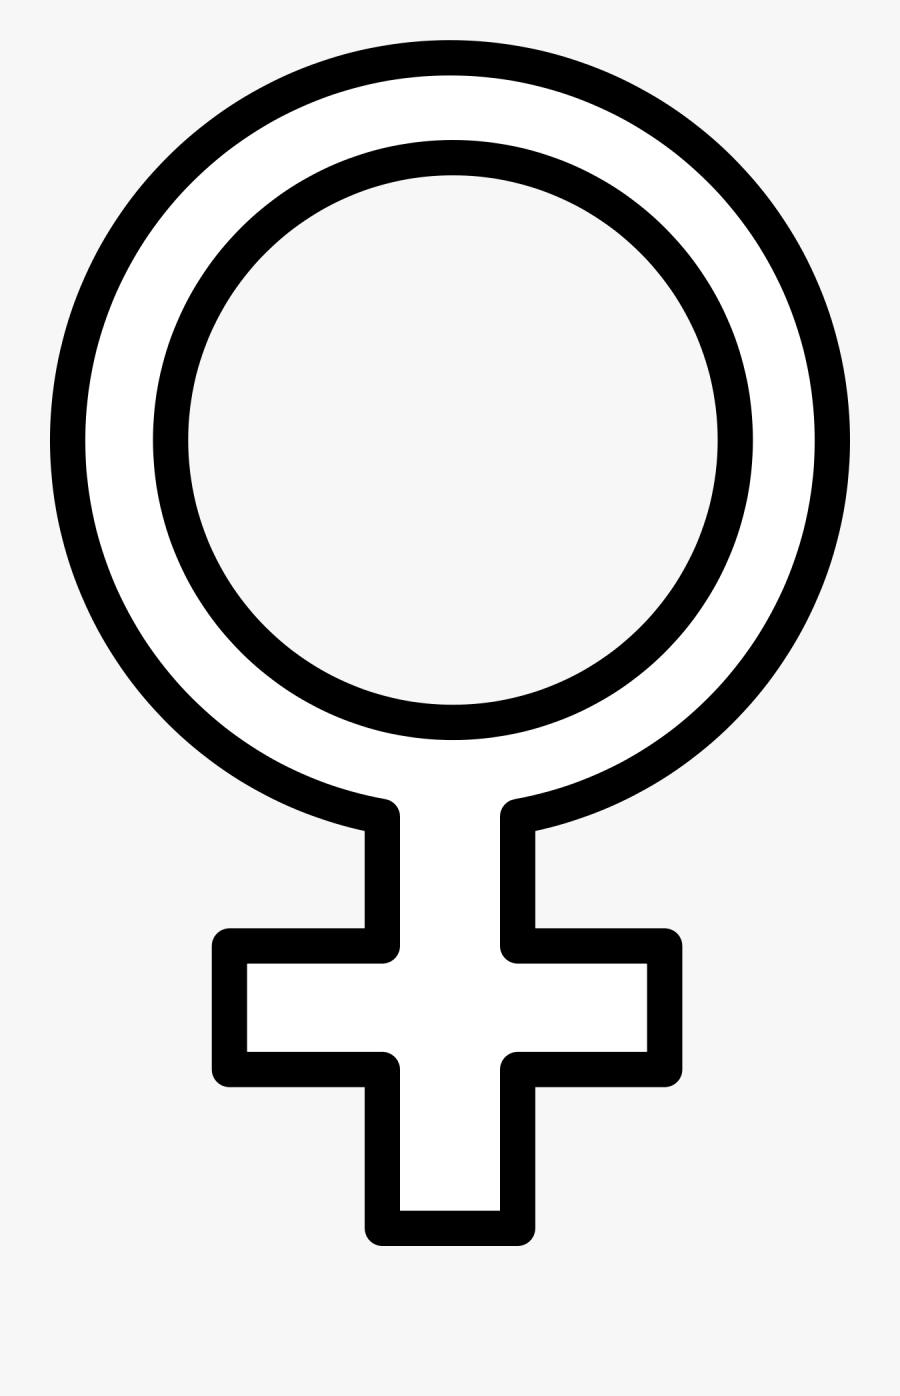 International Symbol For Male Clip Art Download - Female Symbol White Png, Transparent Clipart